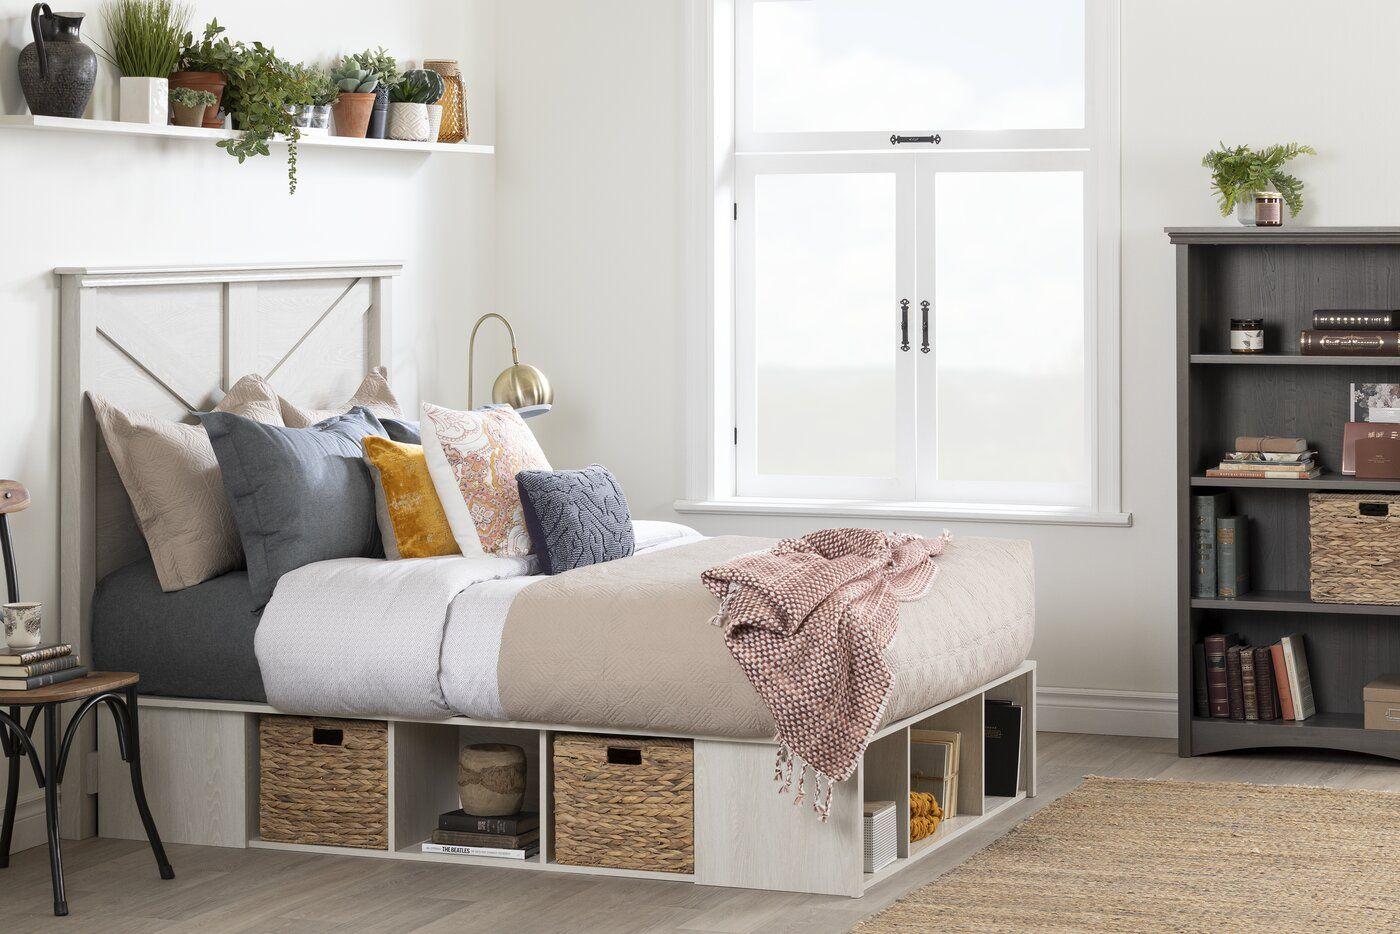 South Shore Avilla Storage Platform Bed Reviews Wayfair Furniture Storage Bed Home South shore bedroom furniture